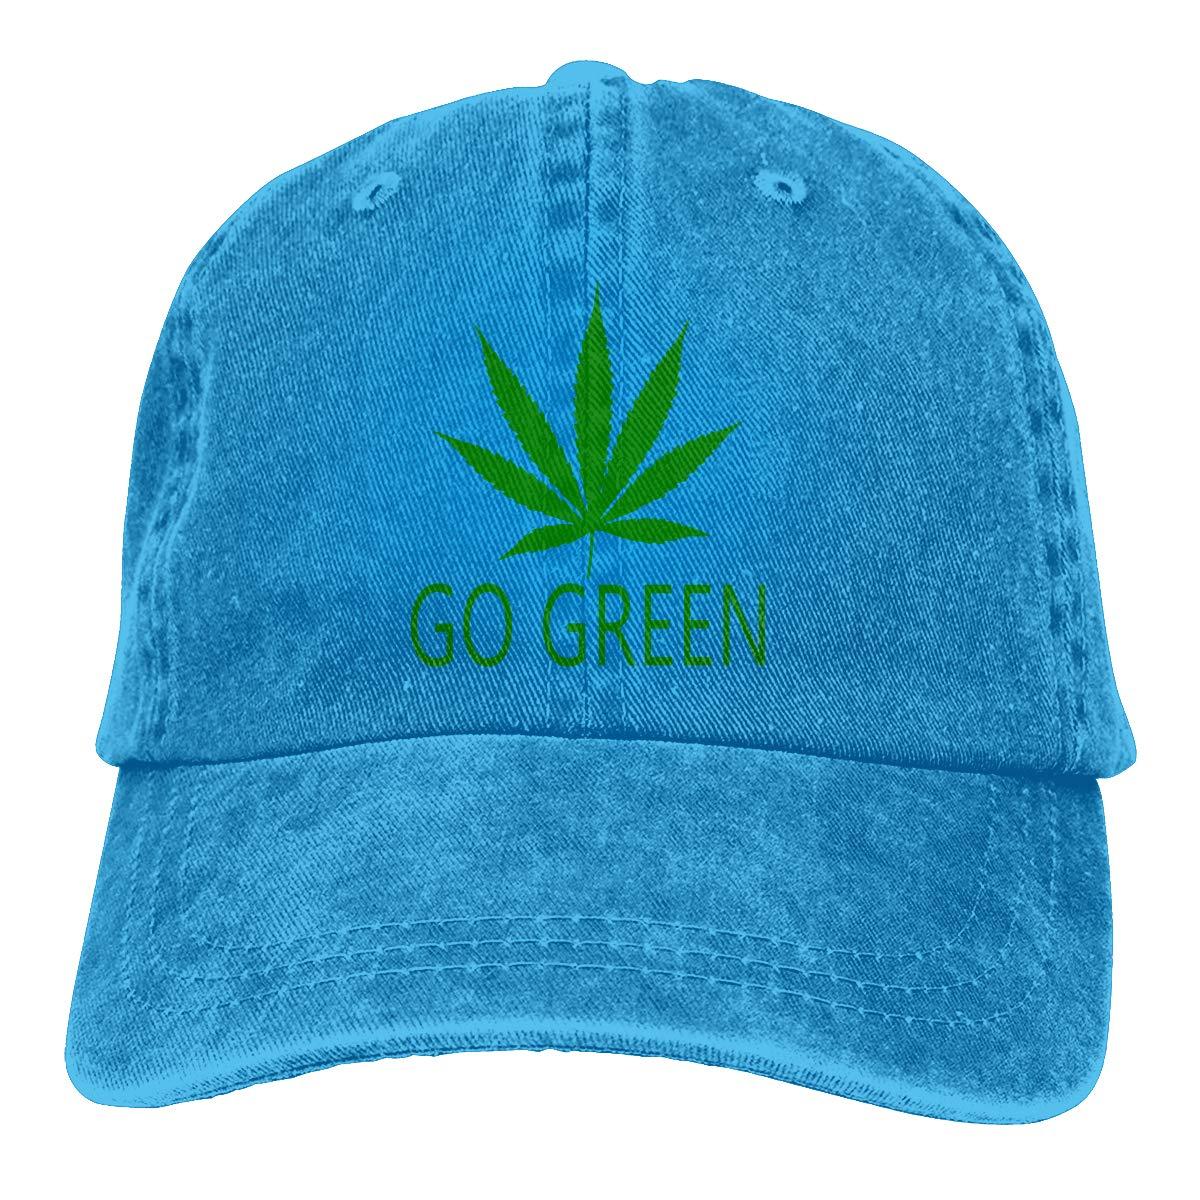 Go Green Weed Pot Leaf Marijuana Cannabis Classic Vintage Jeans Baseball Cap Adjustable Dad Hat for Women and Men